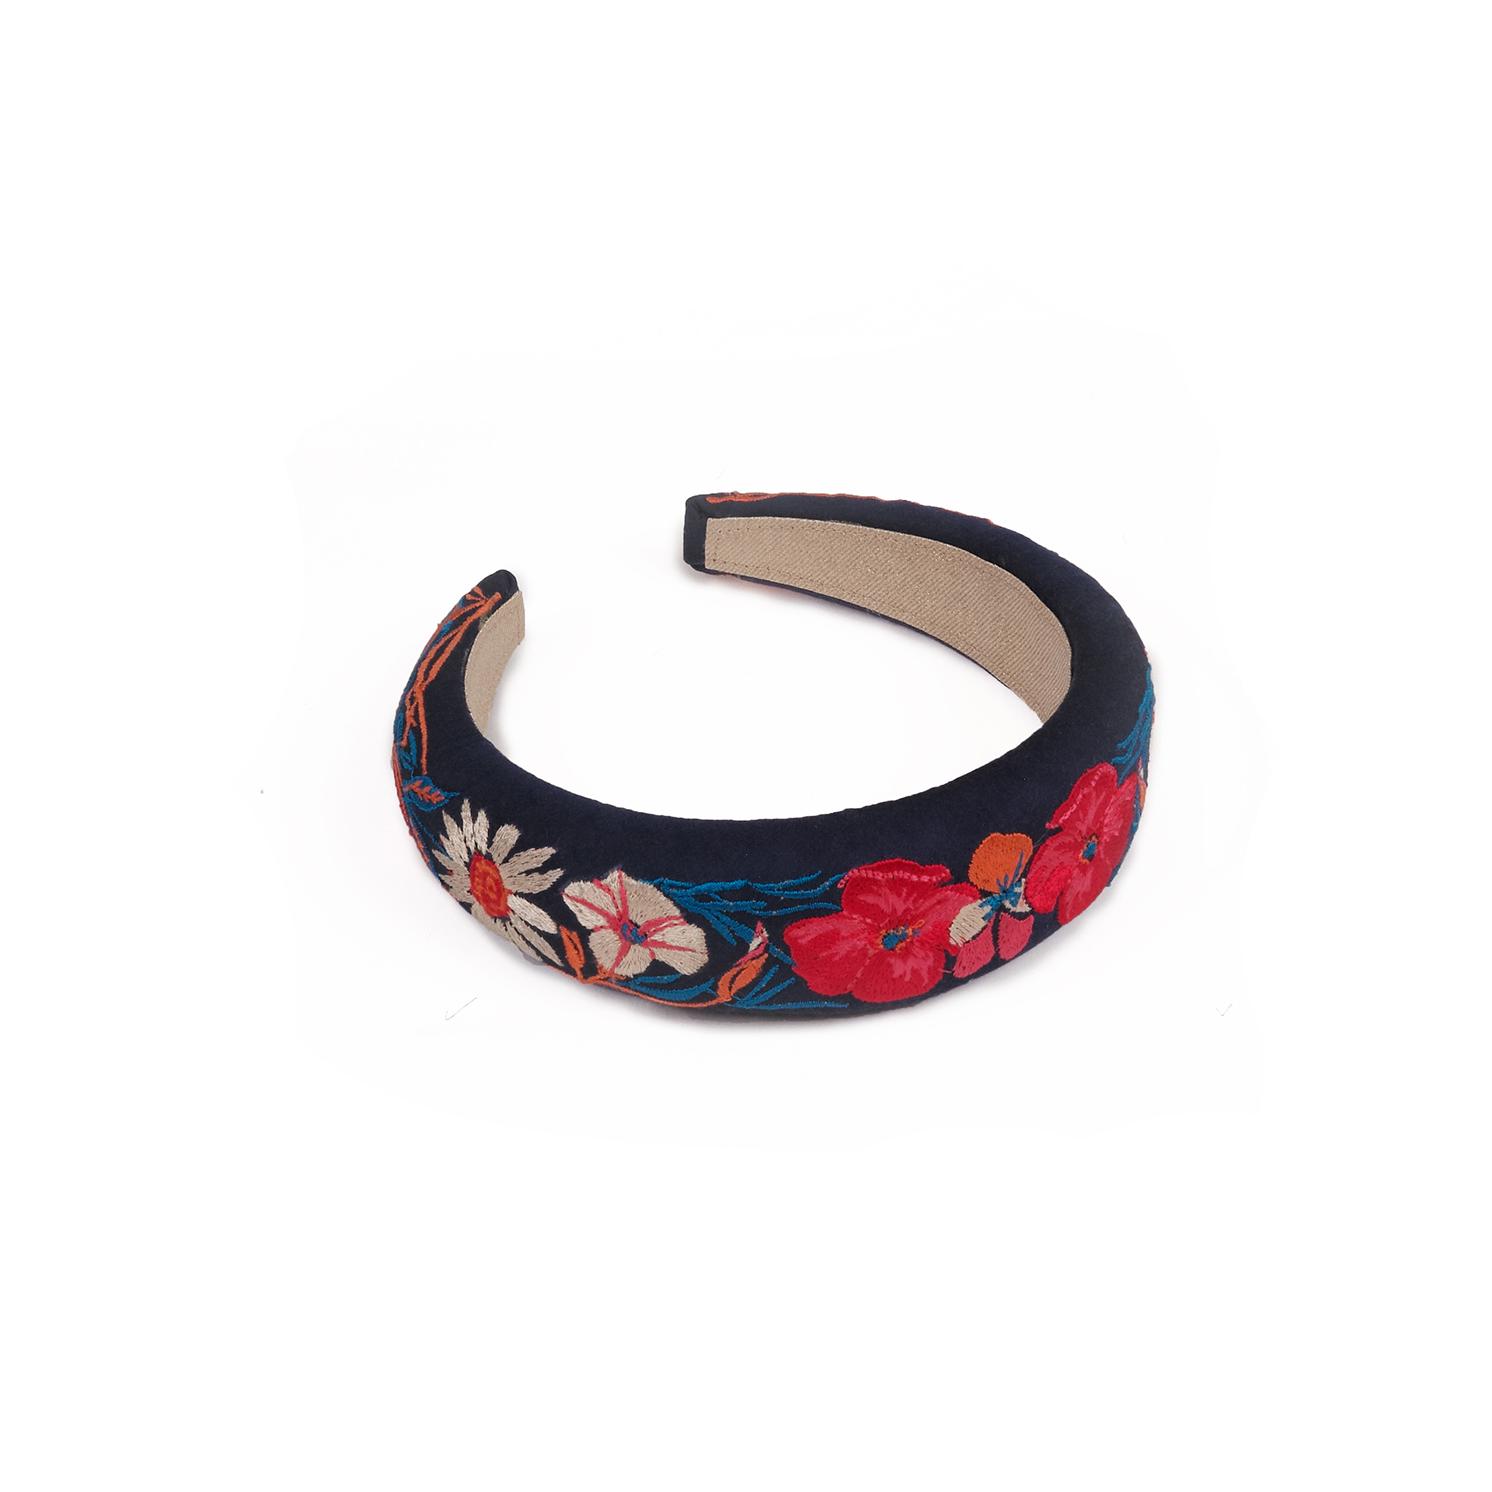 Powder – Navy Country Garden Padded Headband with Powder Presentation Gift Bag